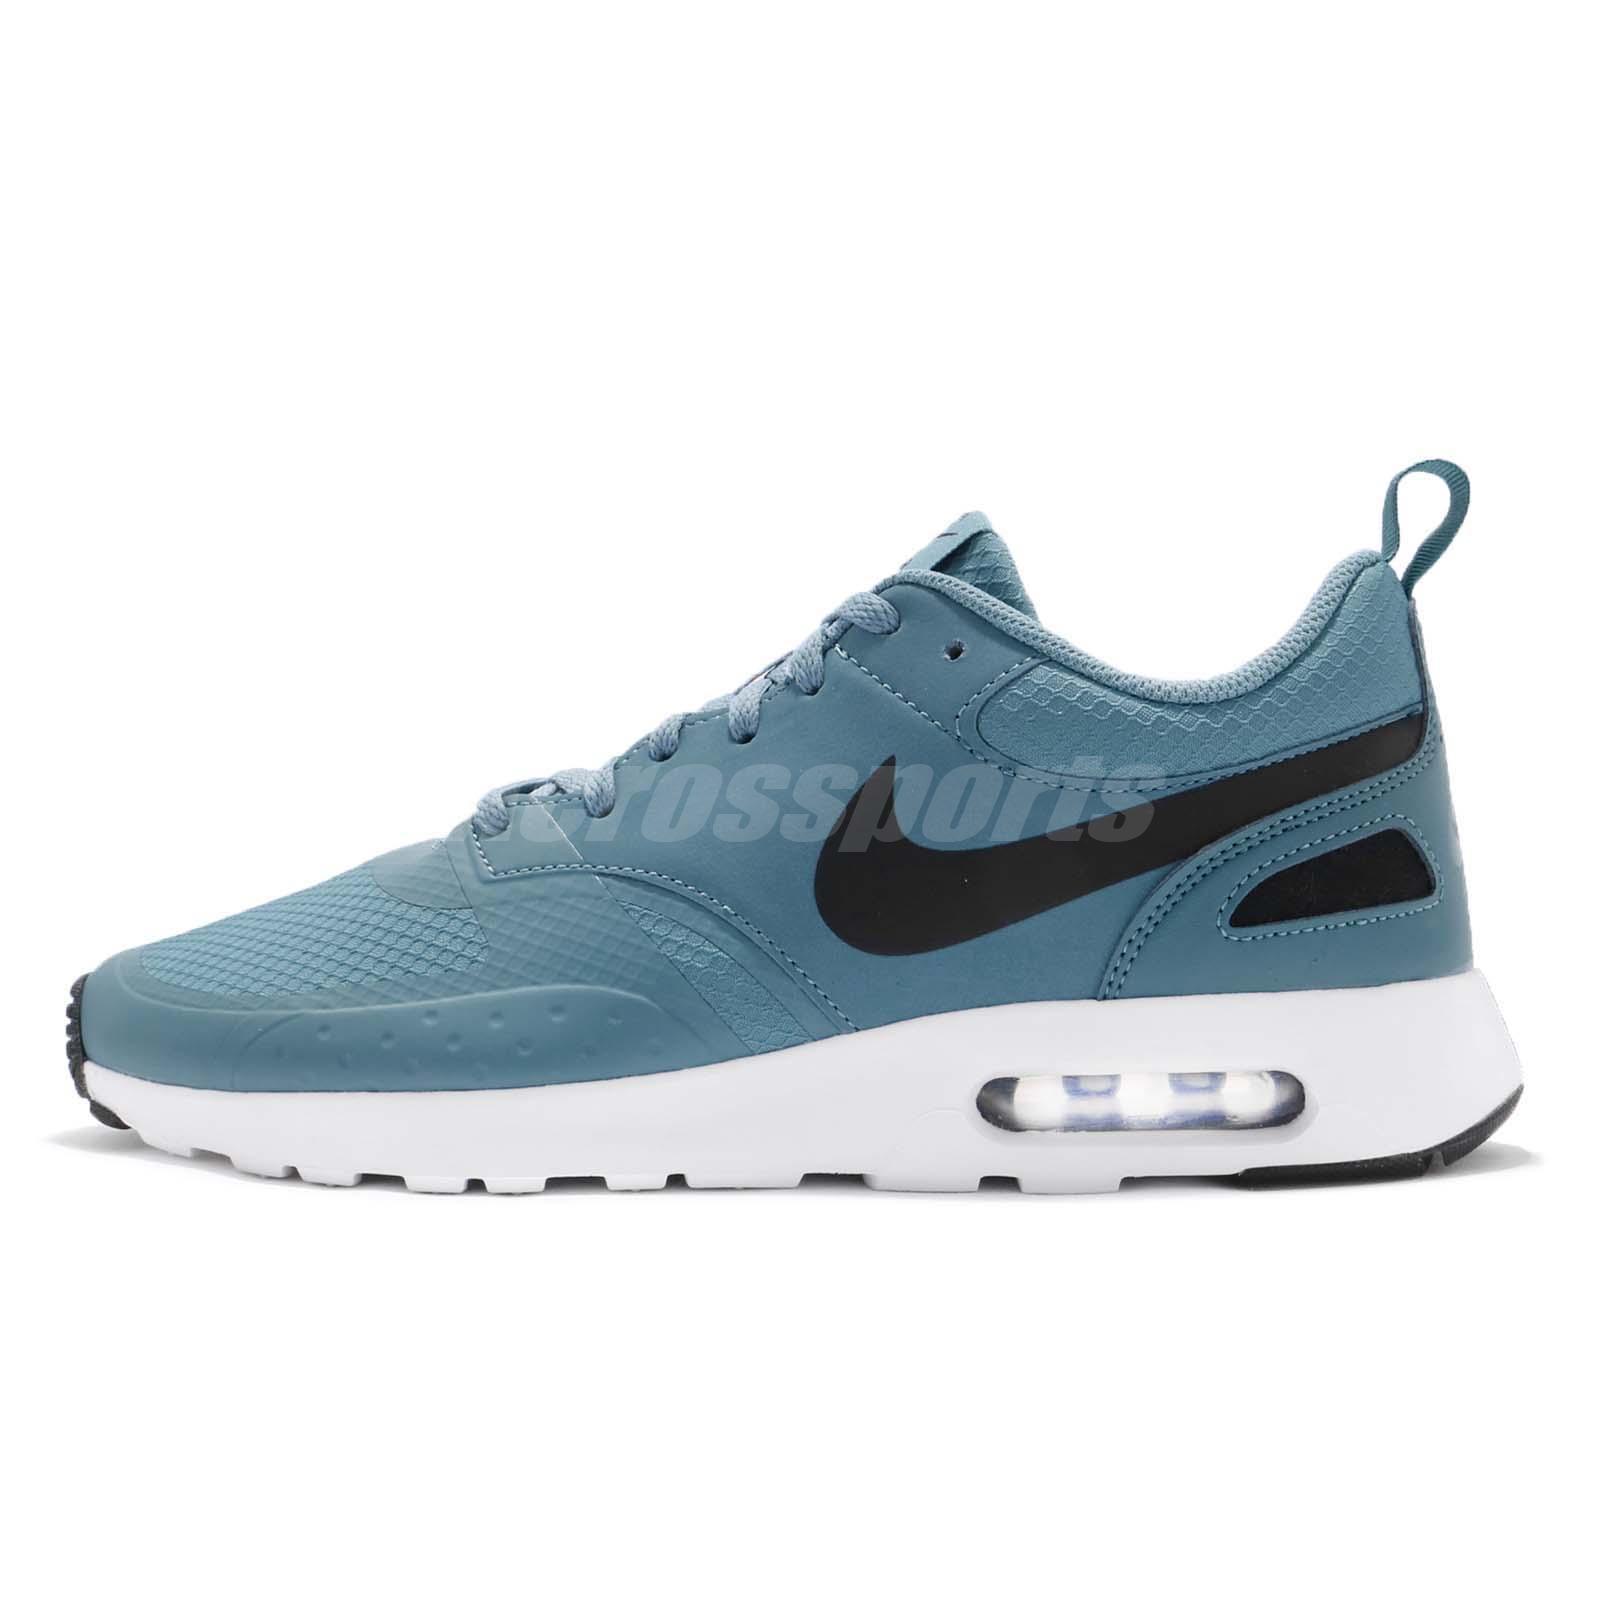 Nike Air Max Vision SE Blue Noise Aqua Black Men Running Shoes 918231-402 1dc647dc5